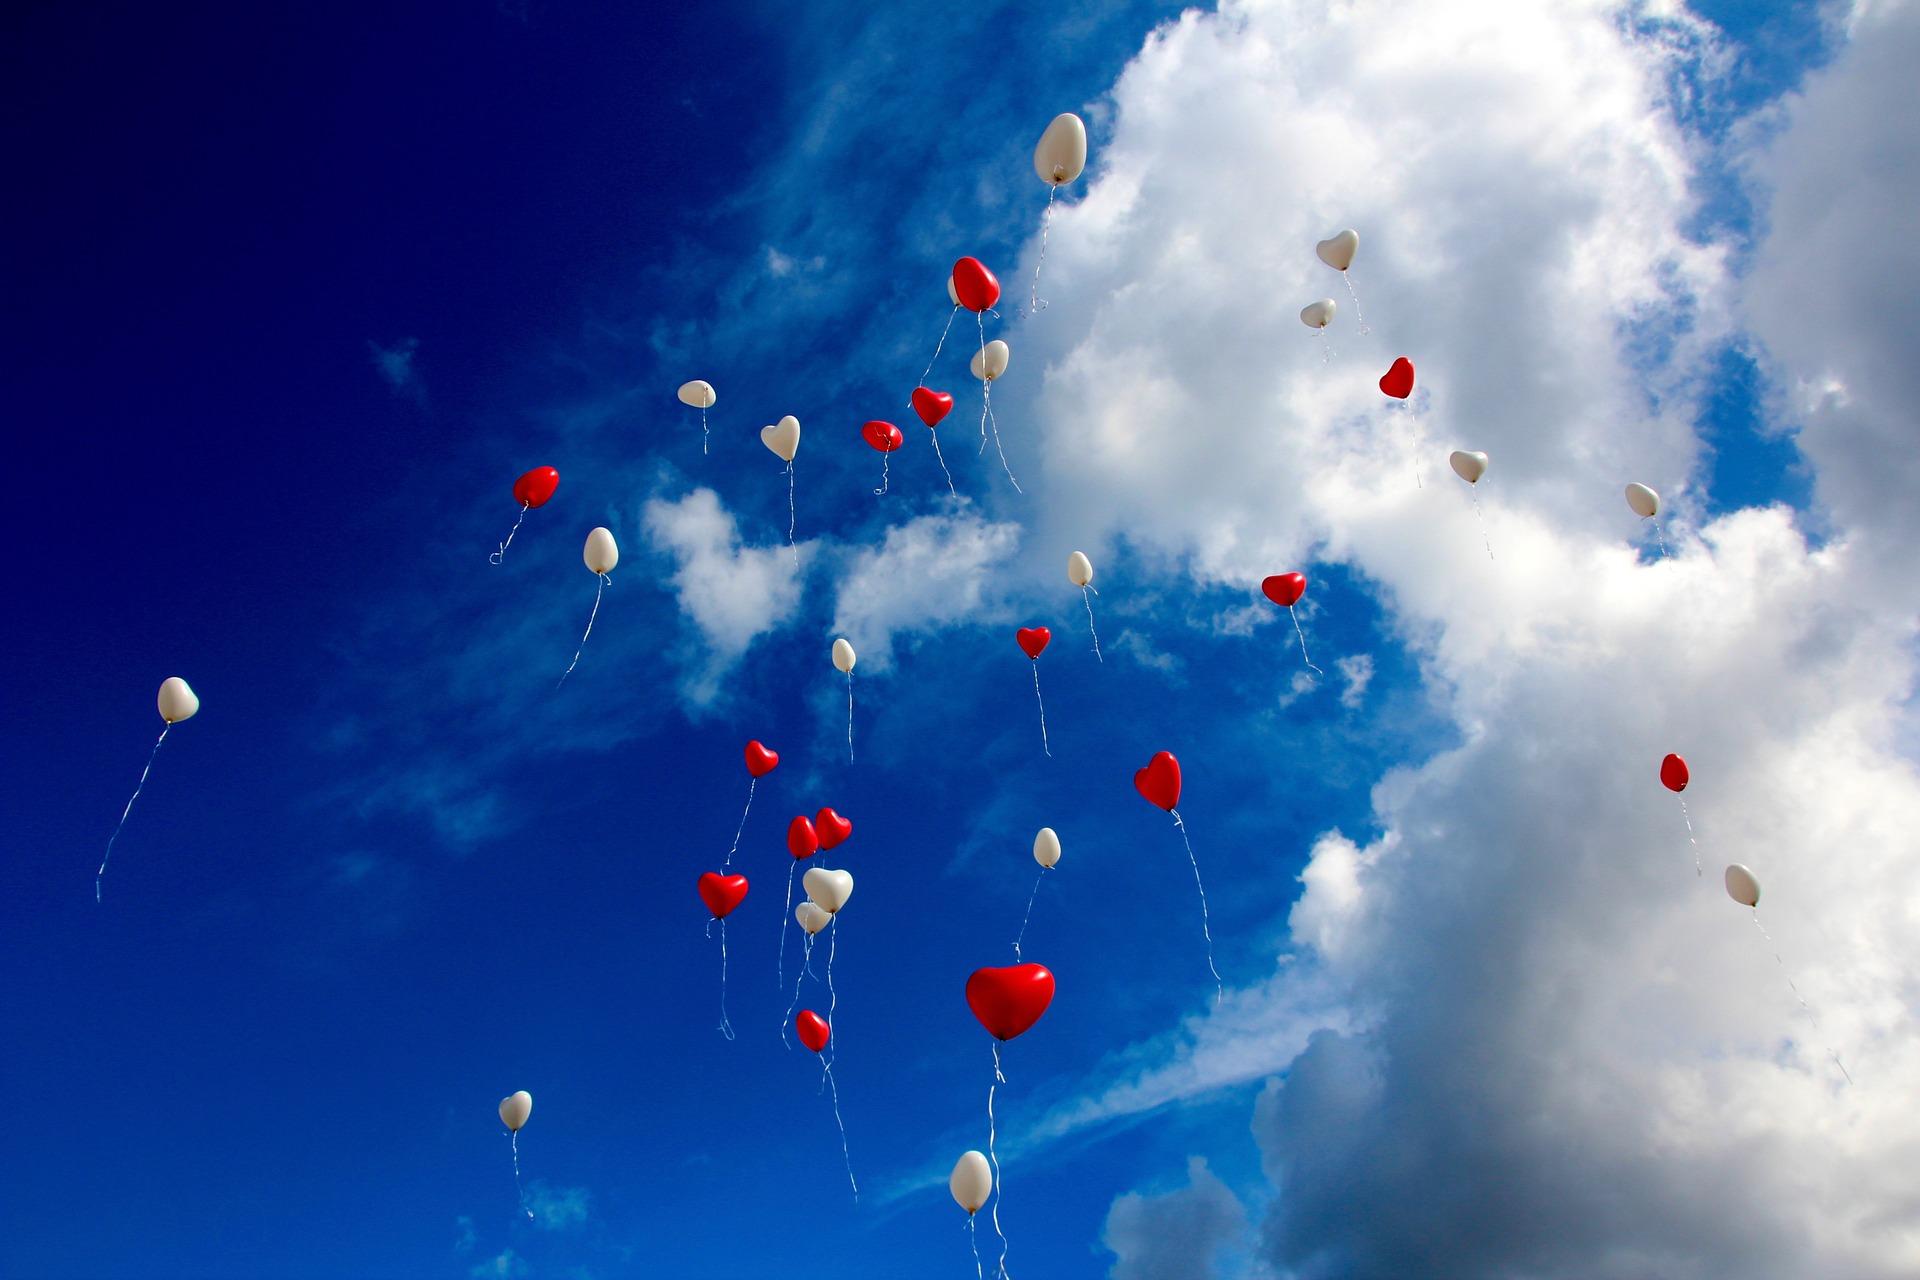 heartballoons